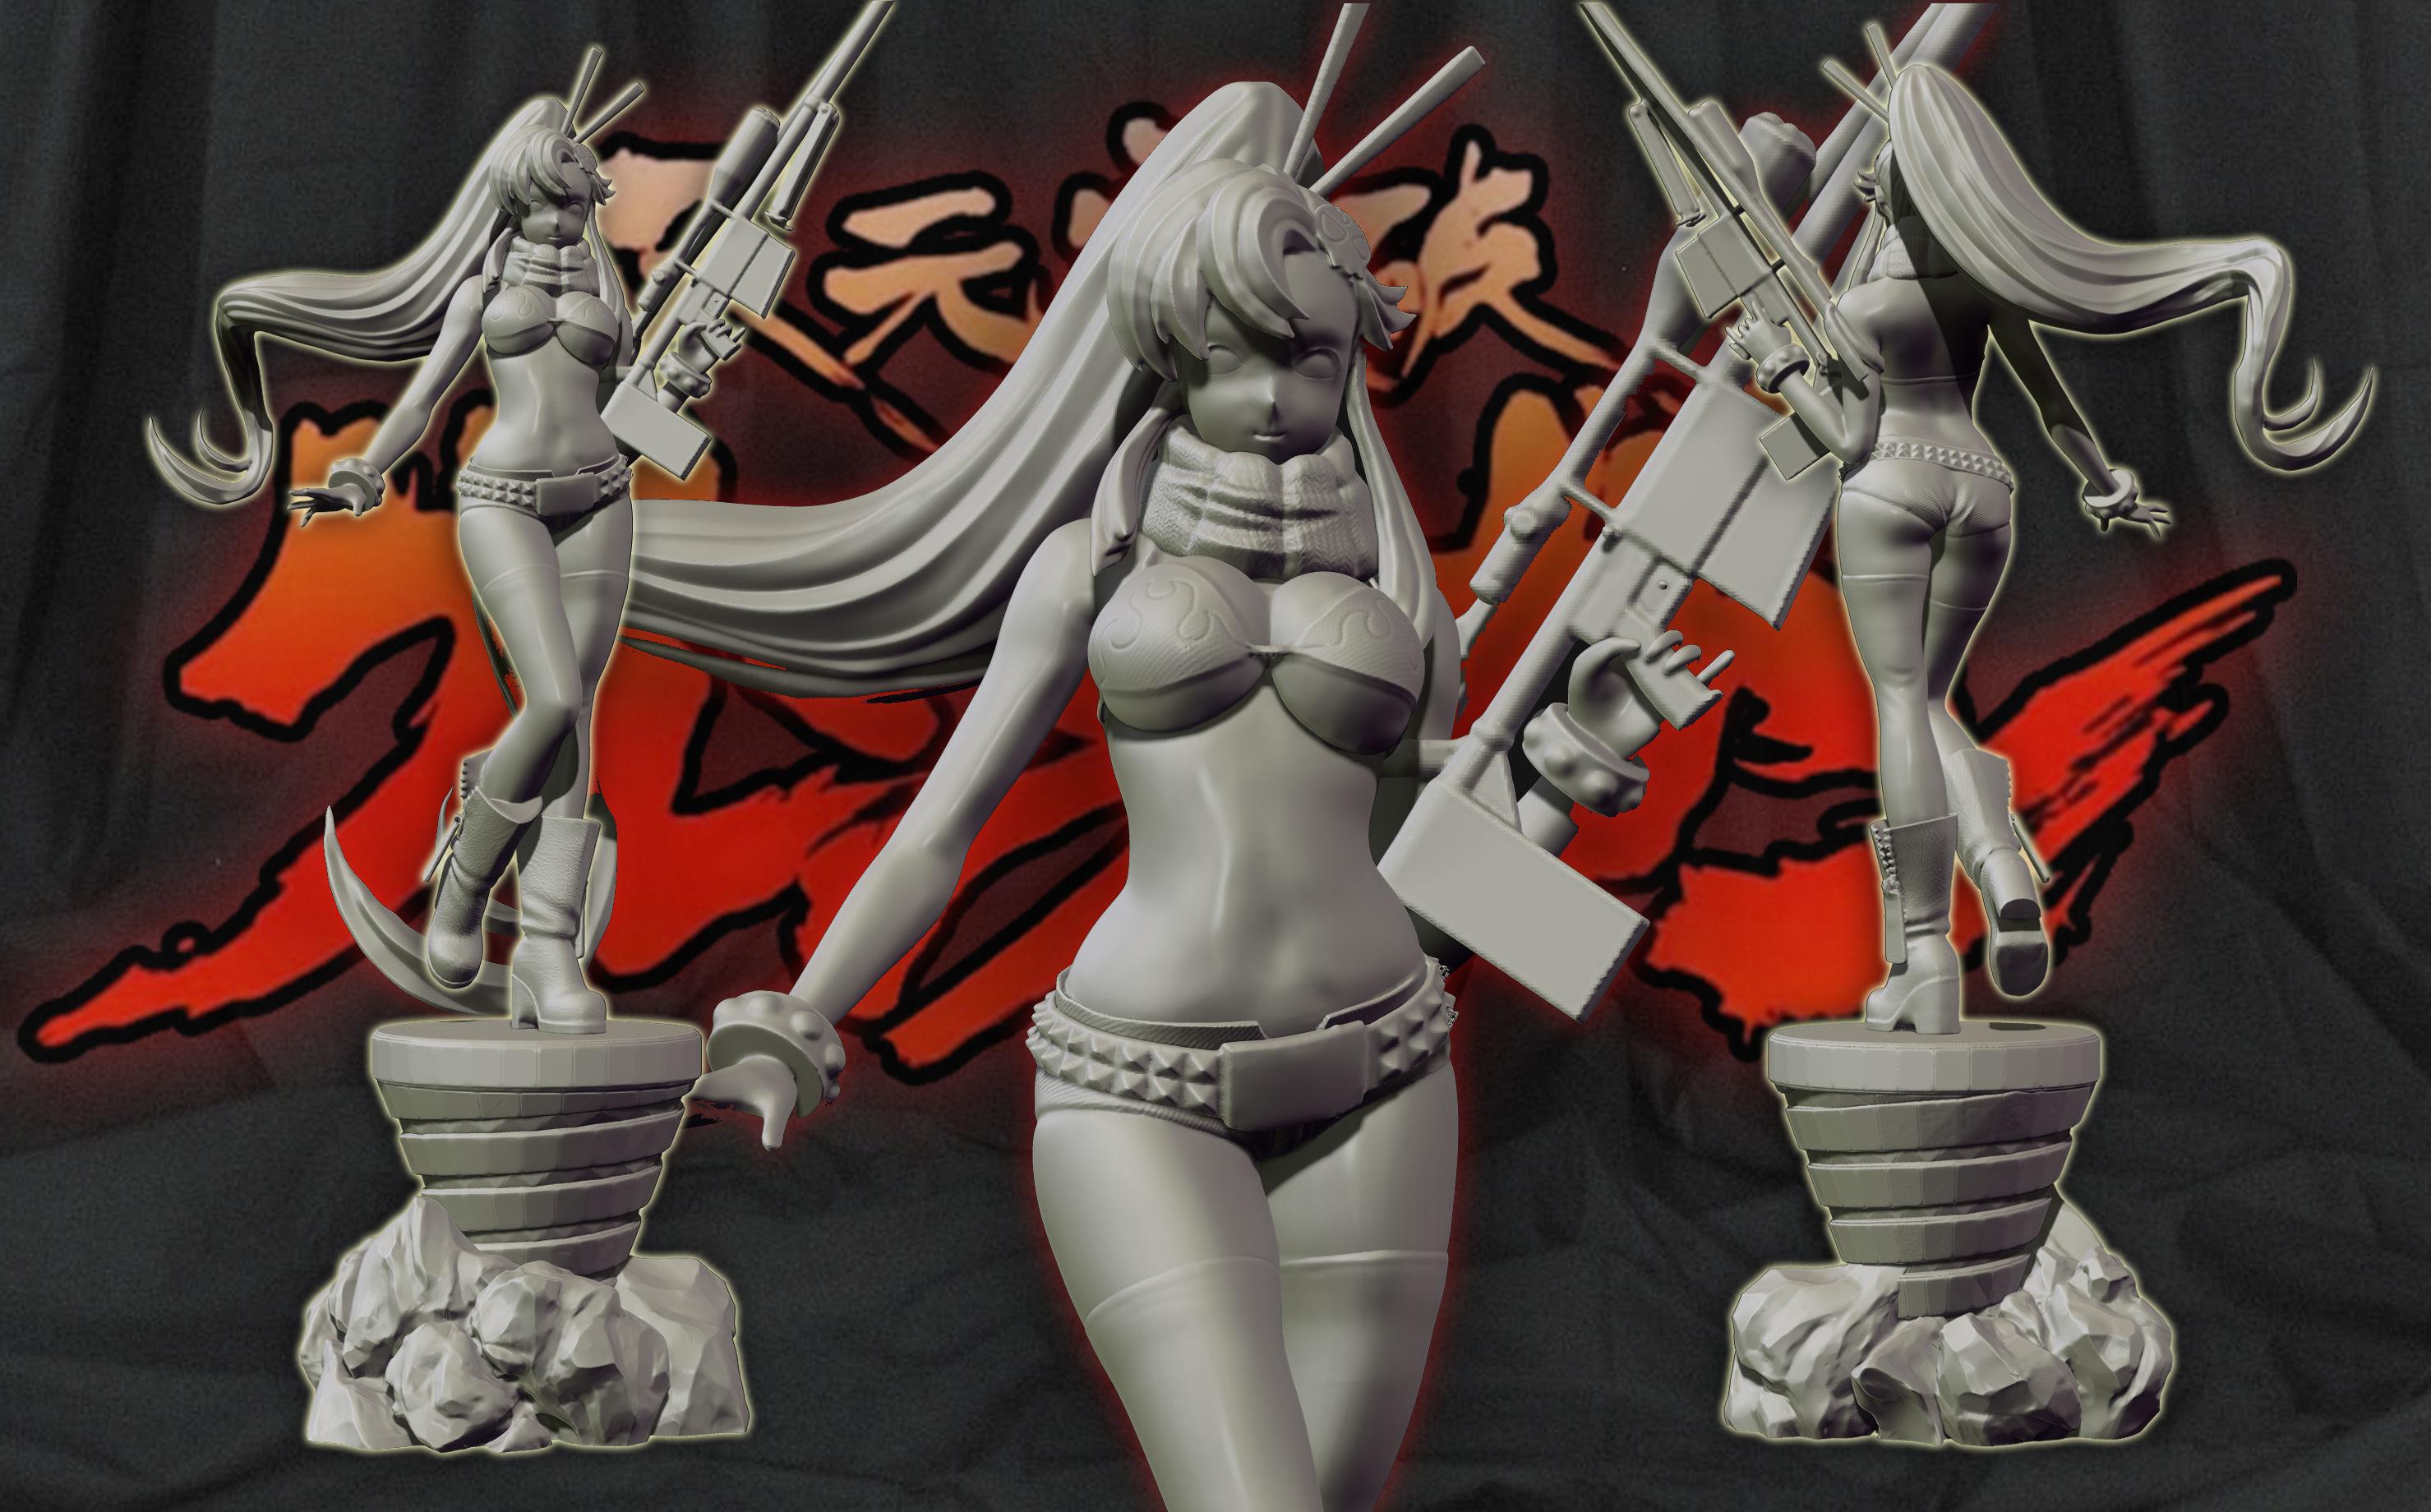 Yoko Littner - gurren lagann 3d print figurine